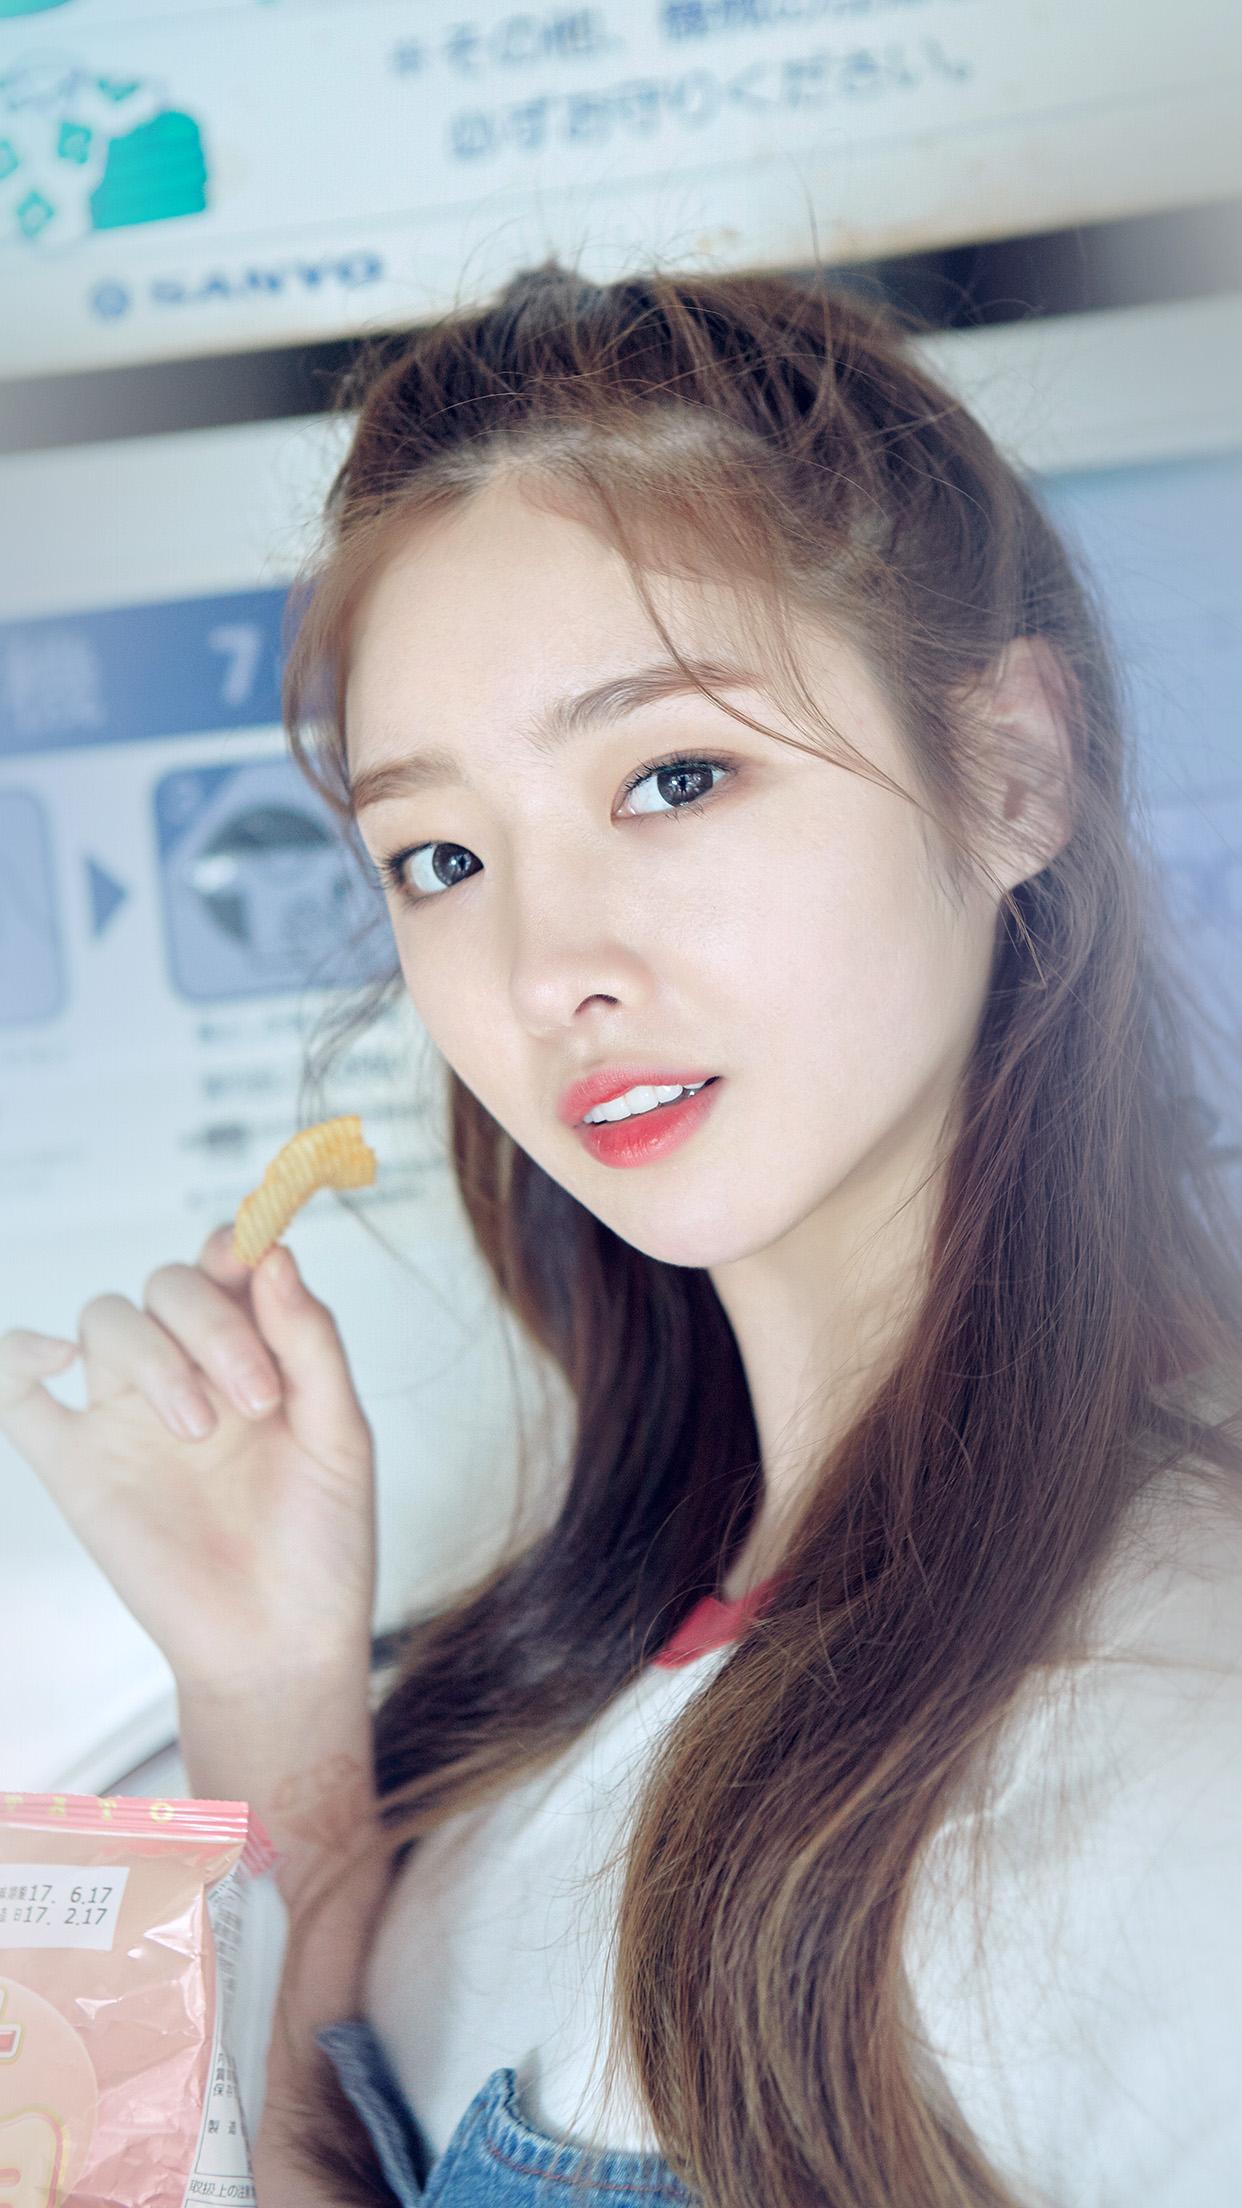 Cute Small Girl Hd Wallpaper Ho02 Cute Girl Kpop Young Wallpaper